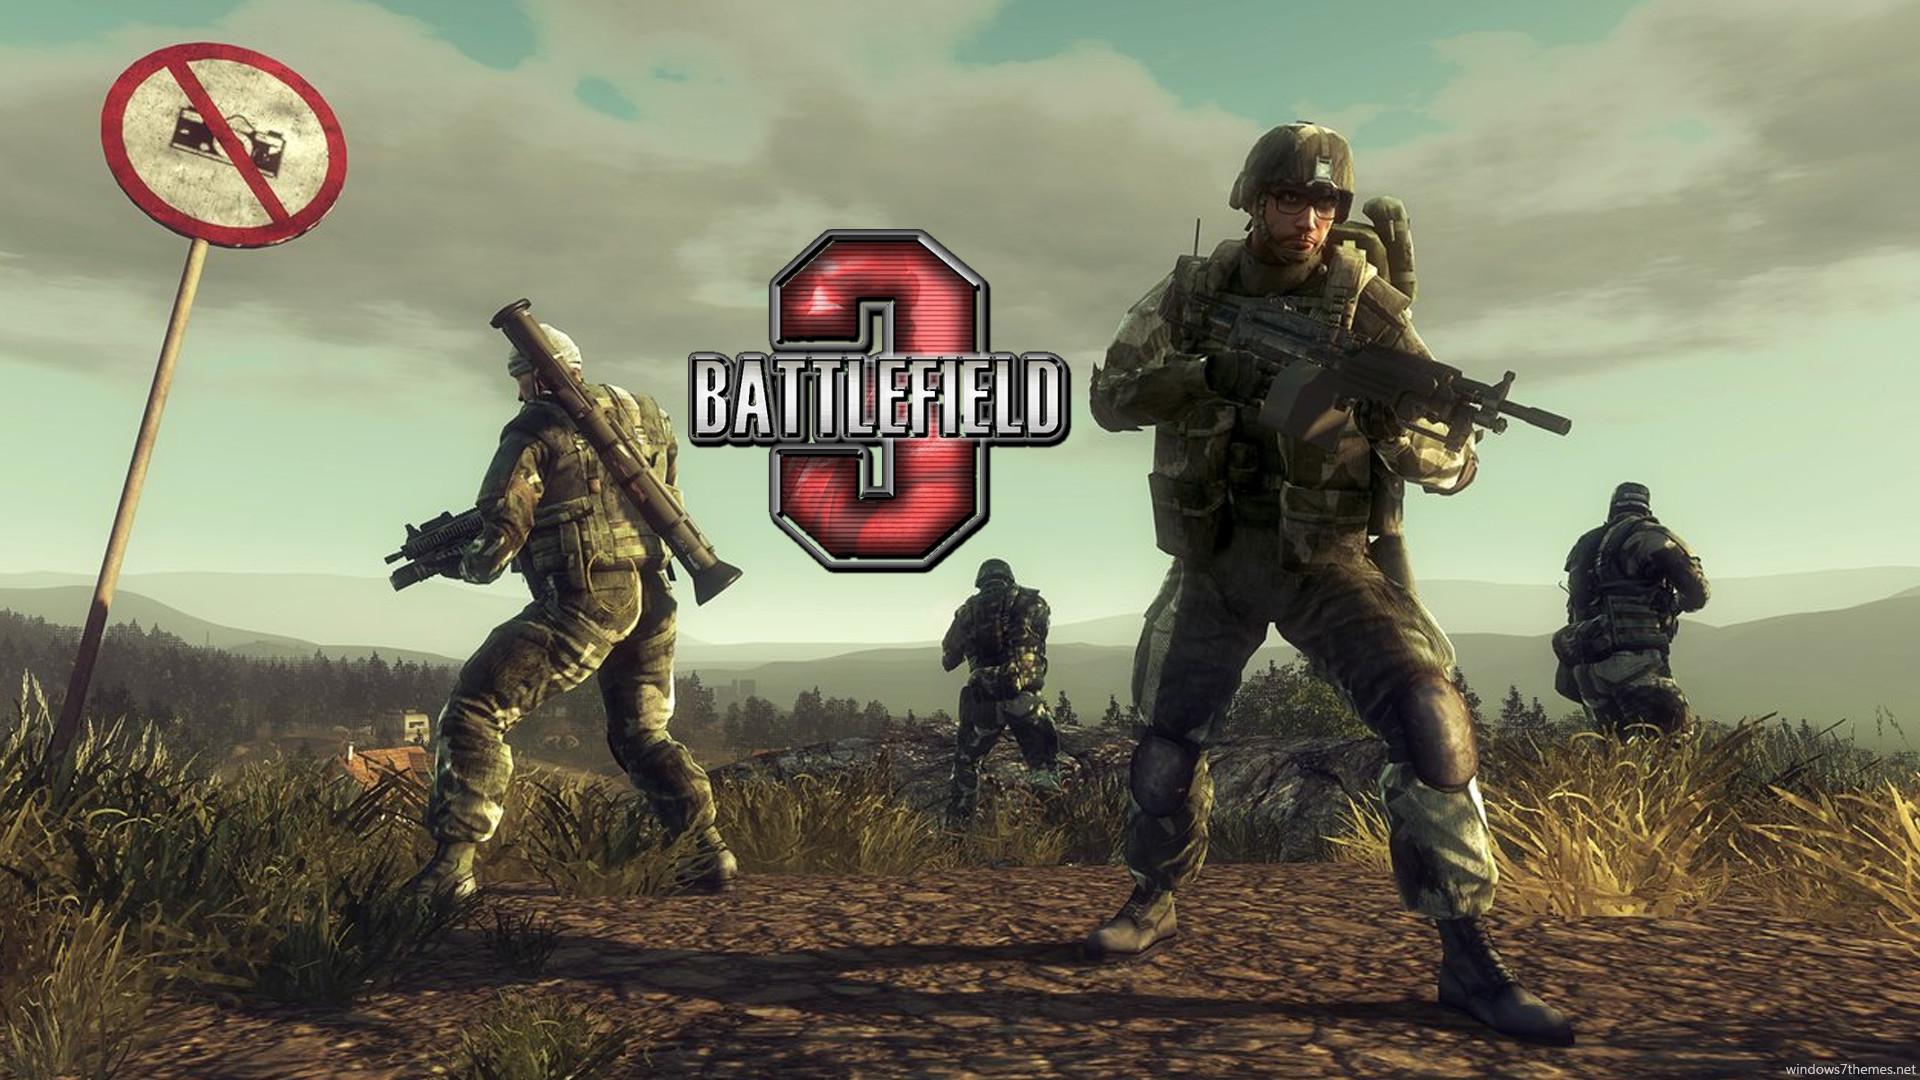 Res: 1920x1080, Download Battlefield 3 Wallpaper 4